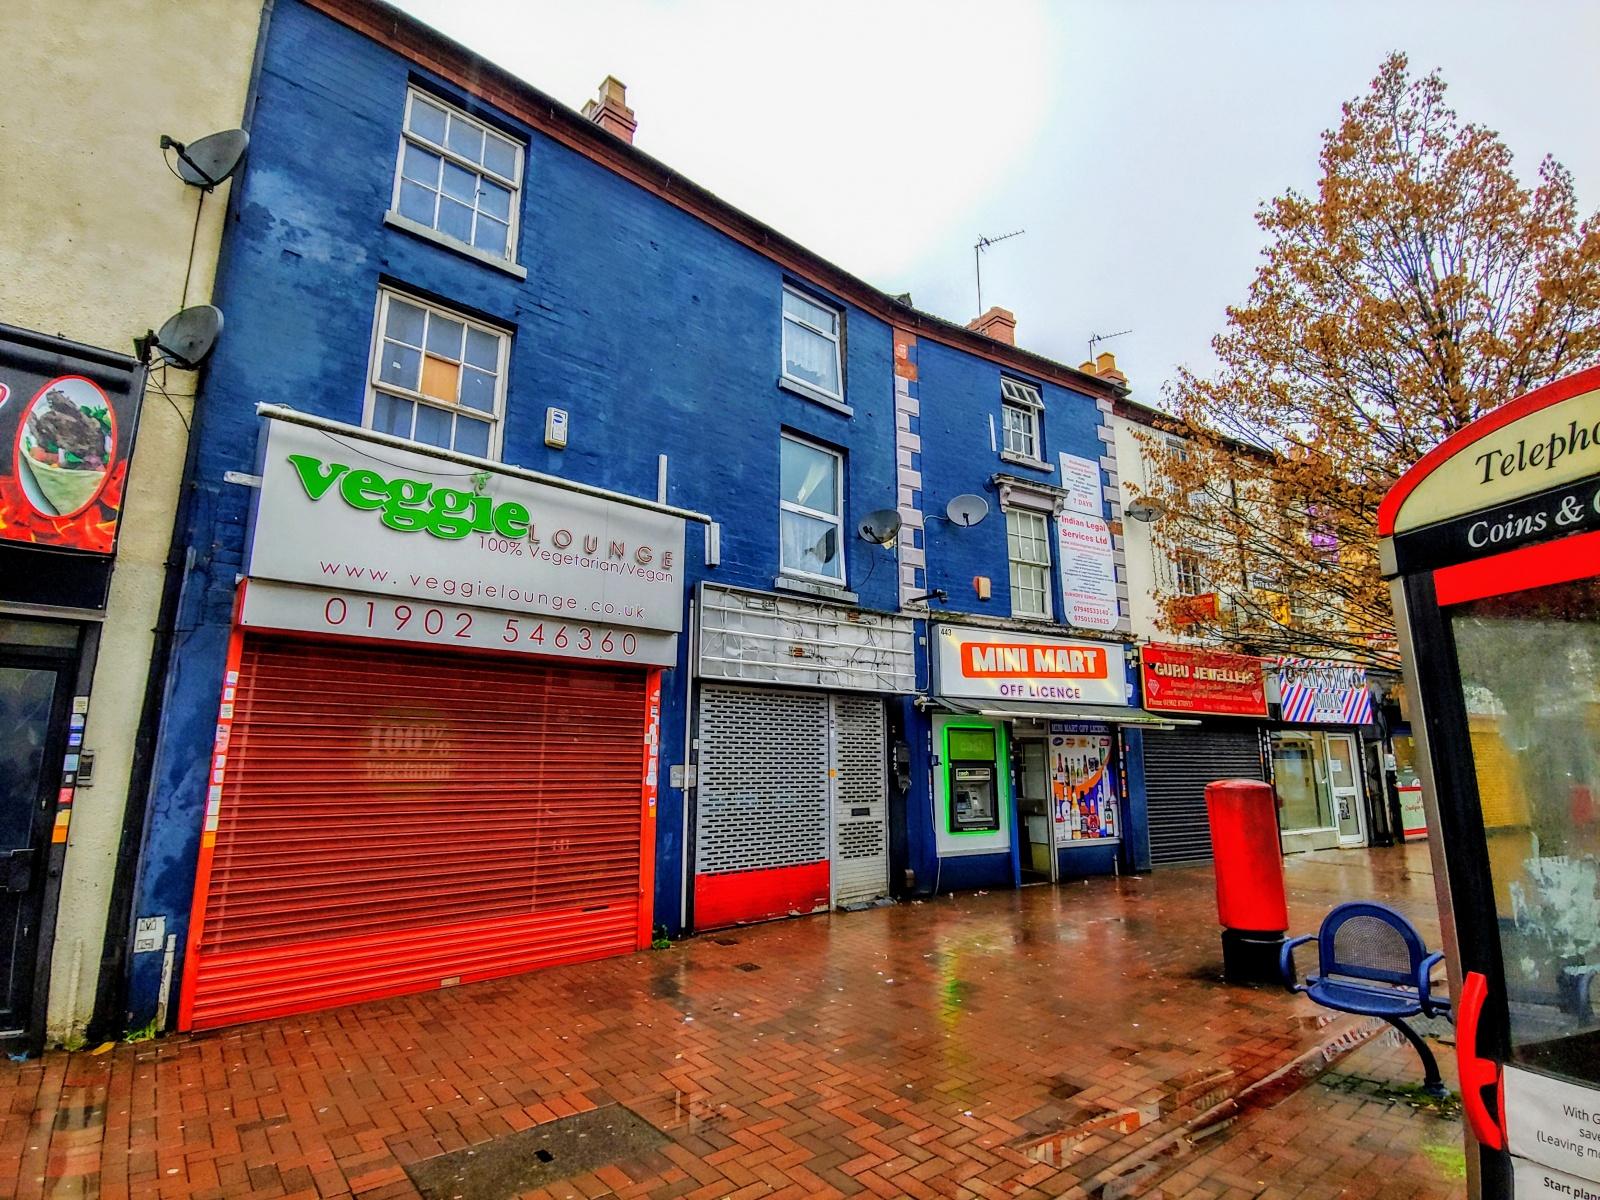 442 Dudley Road, Wolverhampton,